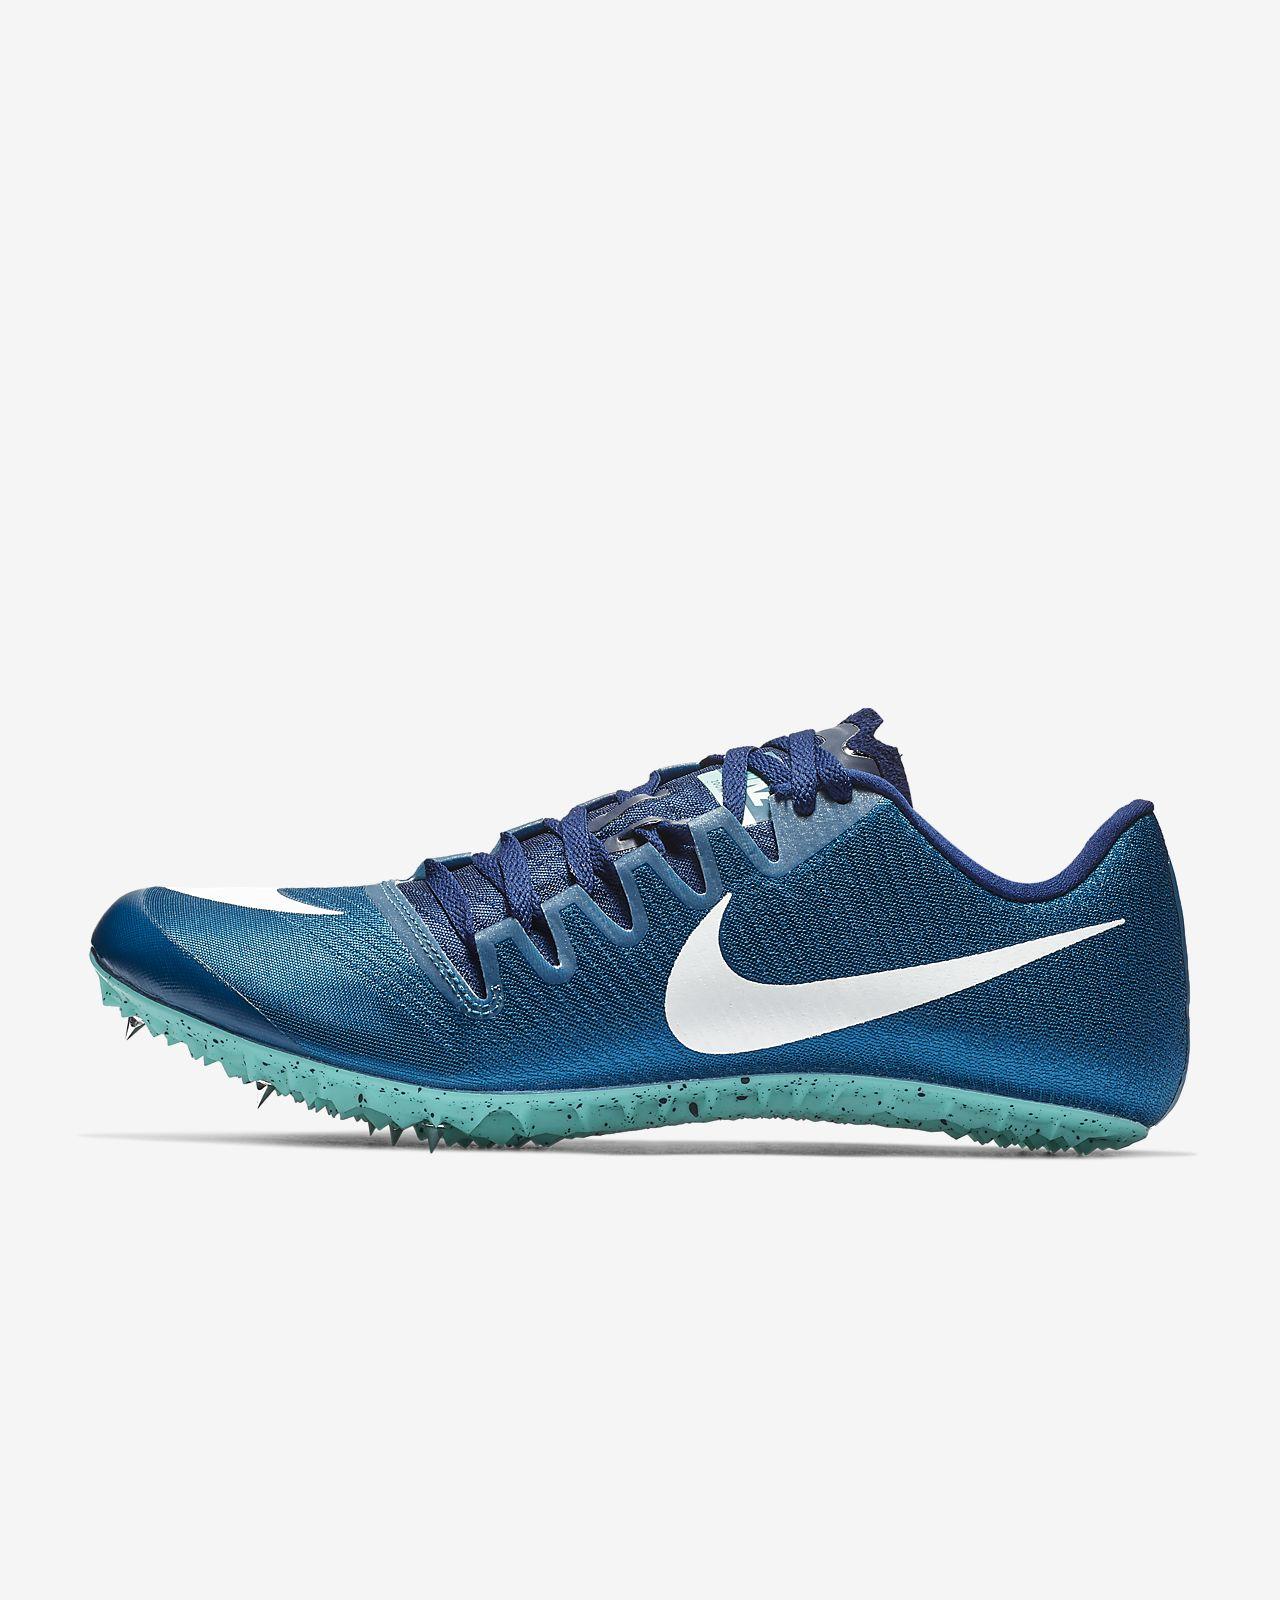 wholesale dealer dbc6e dffa2 ... Nike Zoom Ja Fly 3 Unisex Track Spike